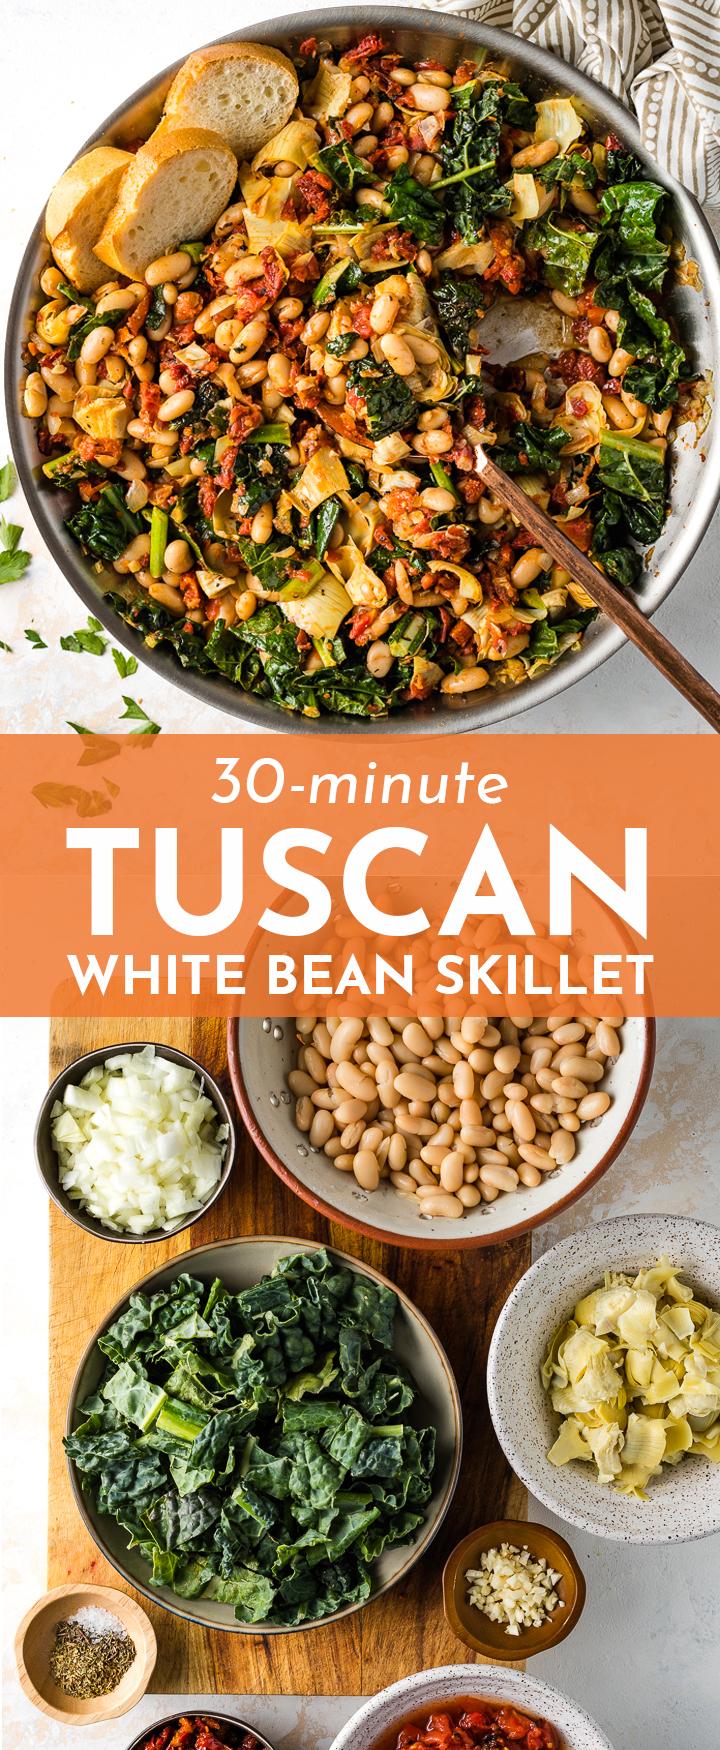 Tuscan White Bean Skillet